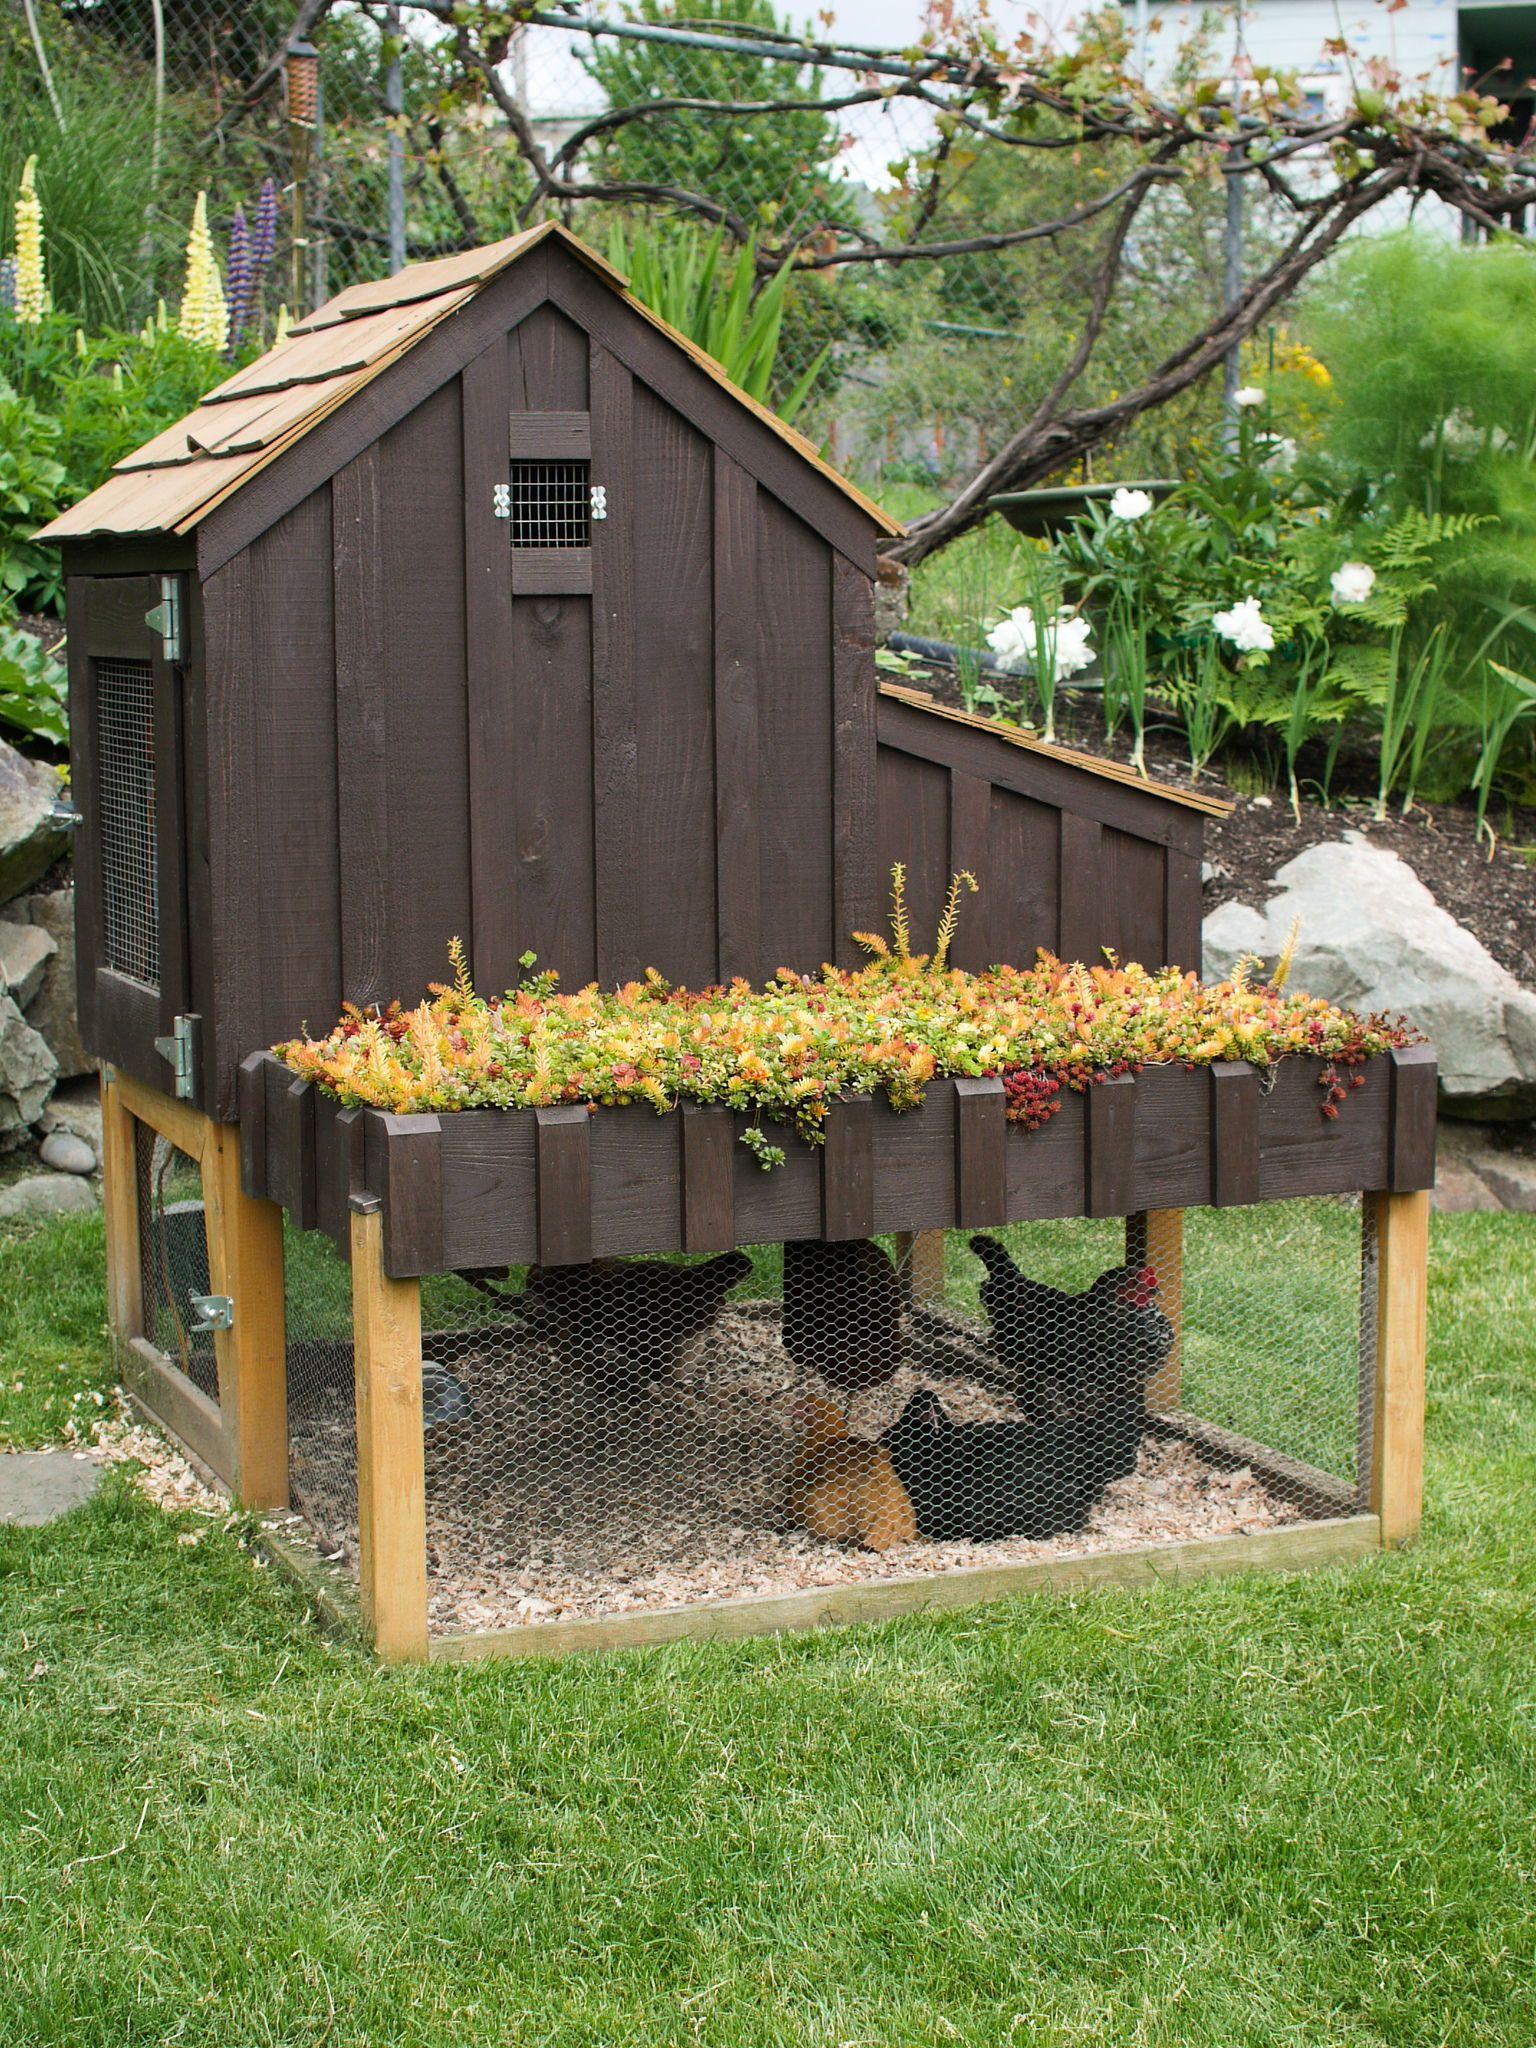 Raising Backyard Chickens Freecycle Usa Chicken Diy Small Chicken Coops Chickens Backyard Small backyard chicken coop designs